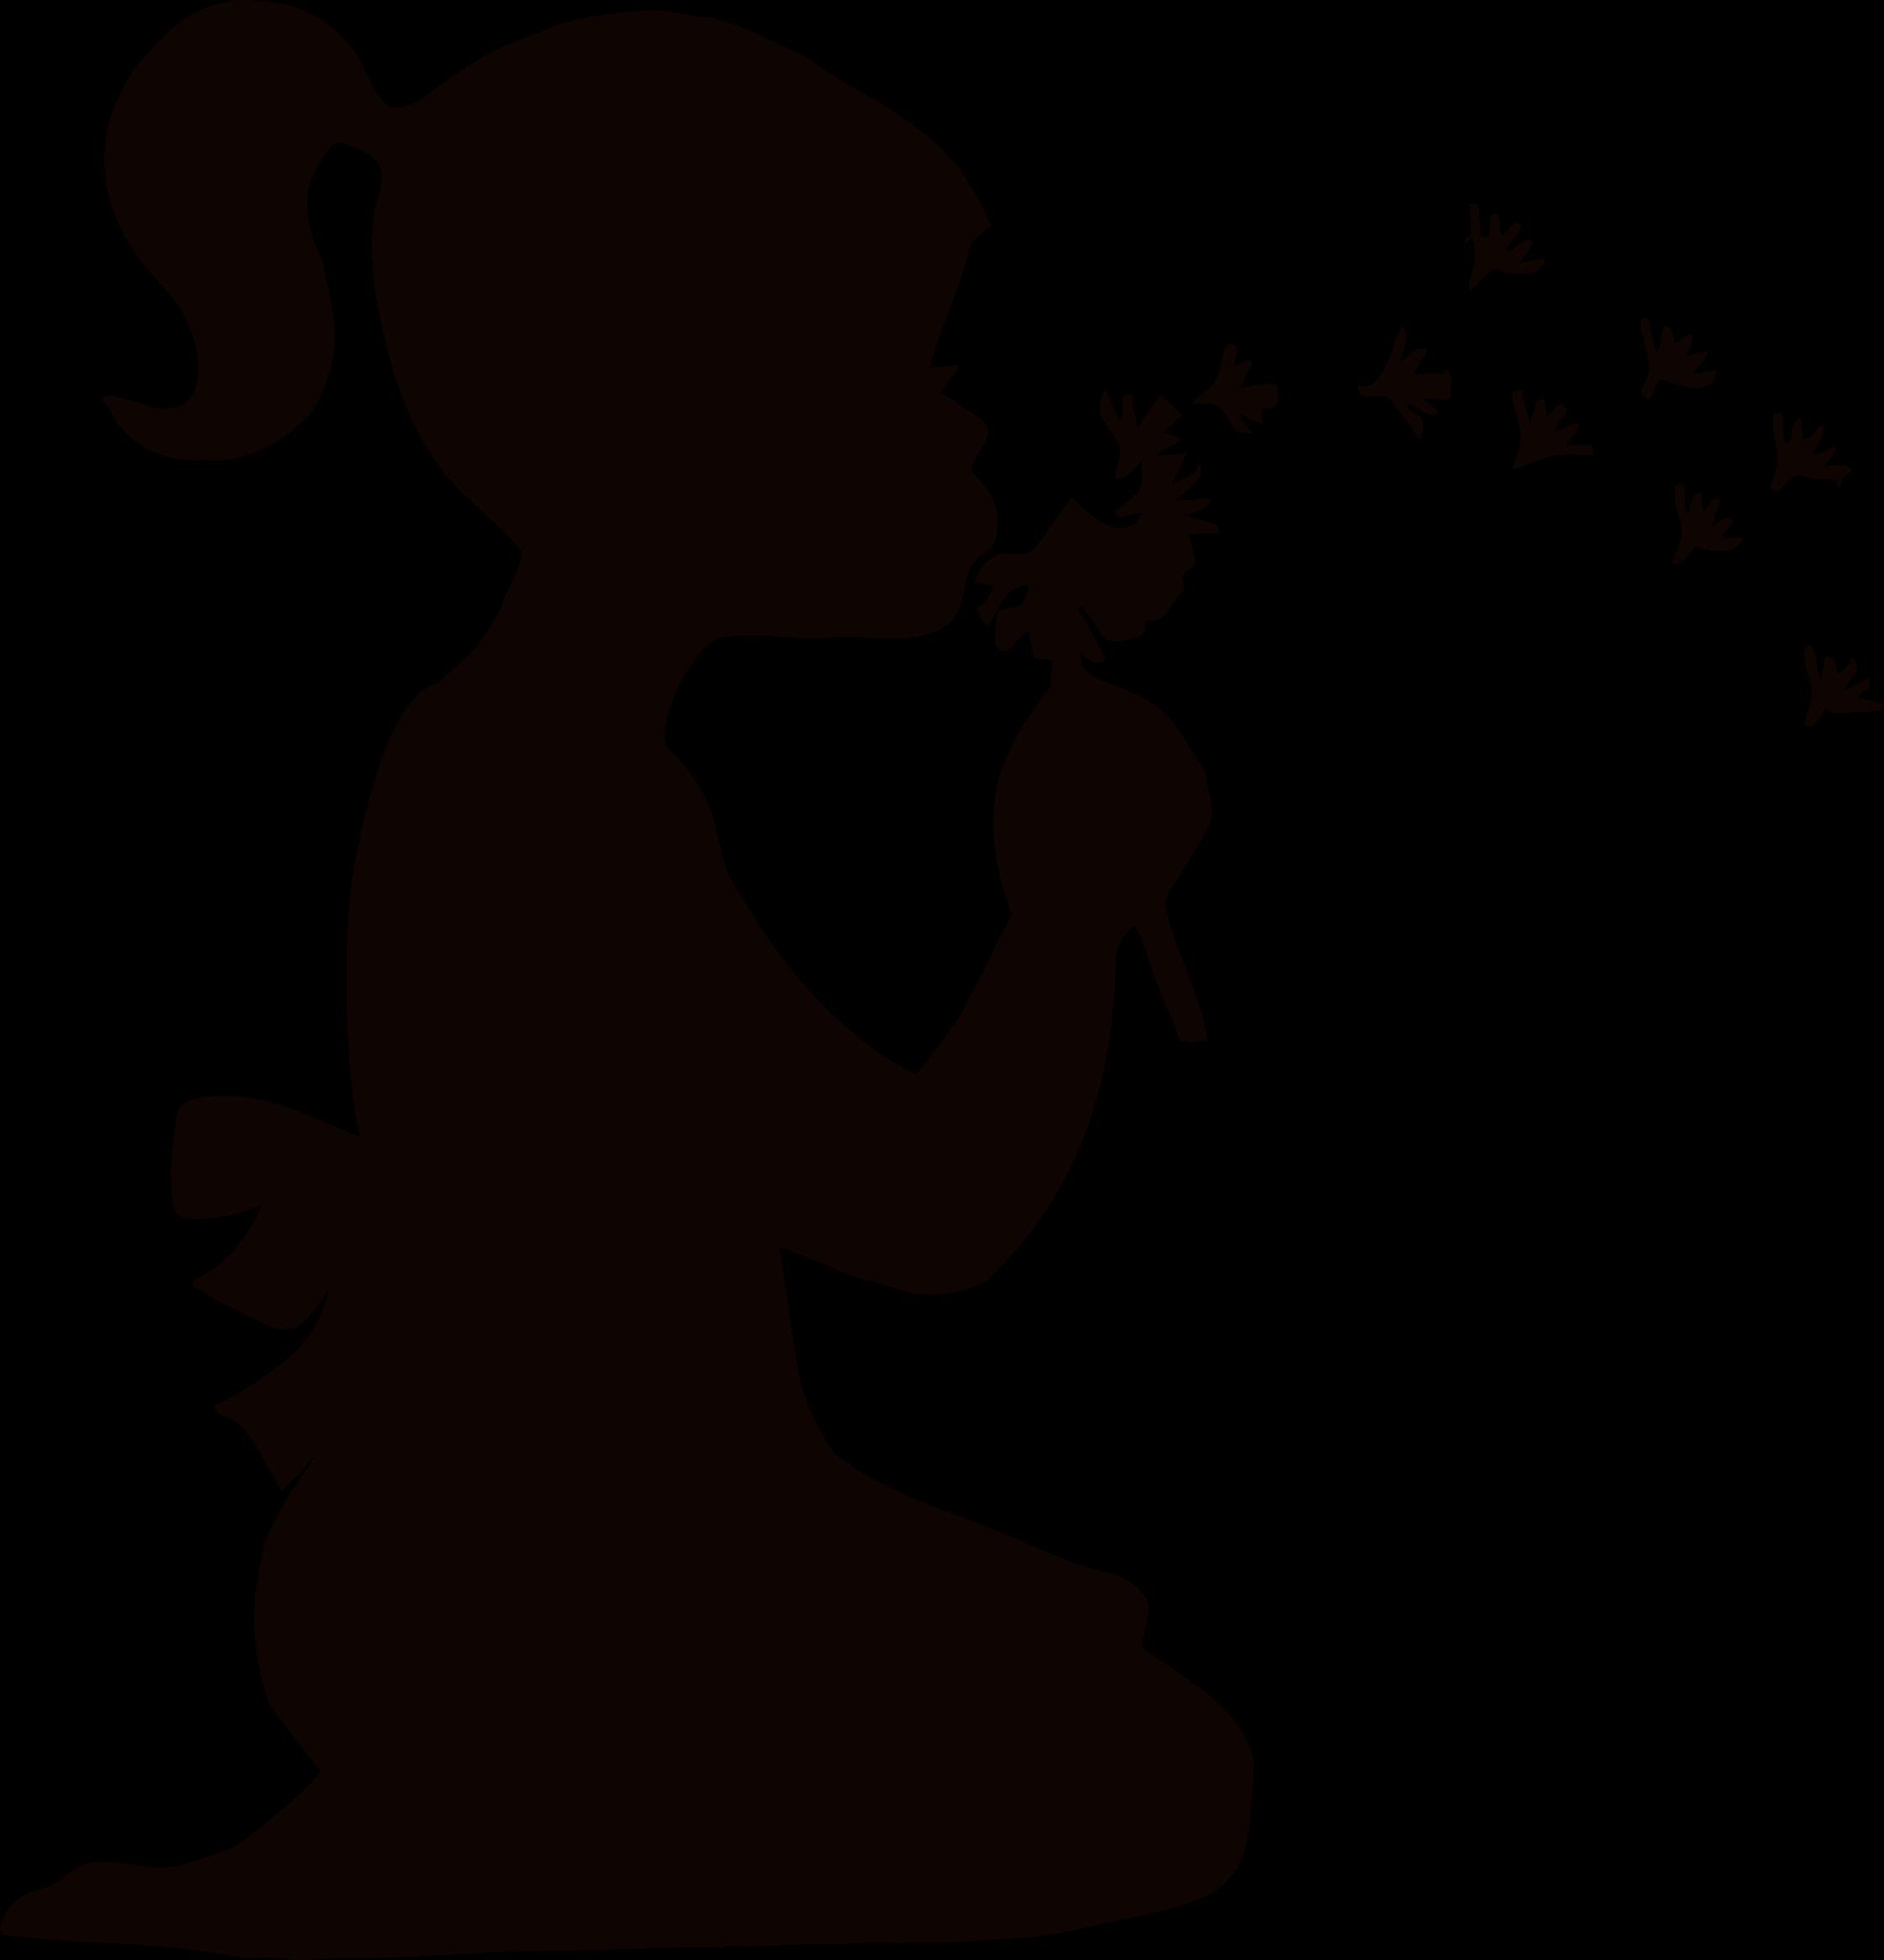 2244x2334 Girl Dispersing Dandelions Icons Png